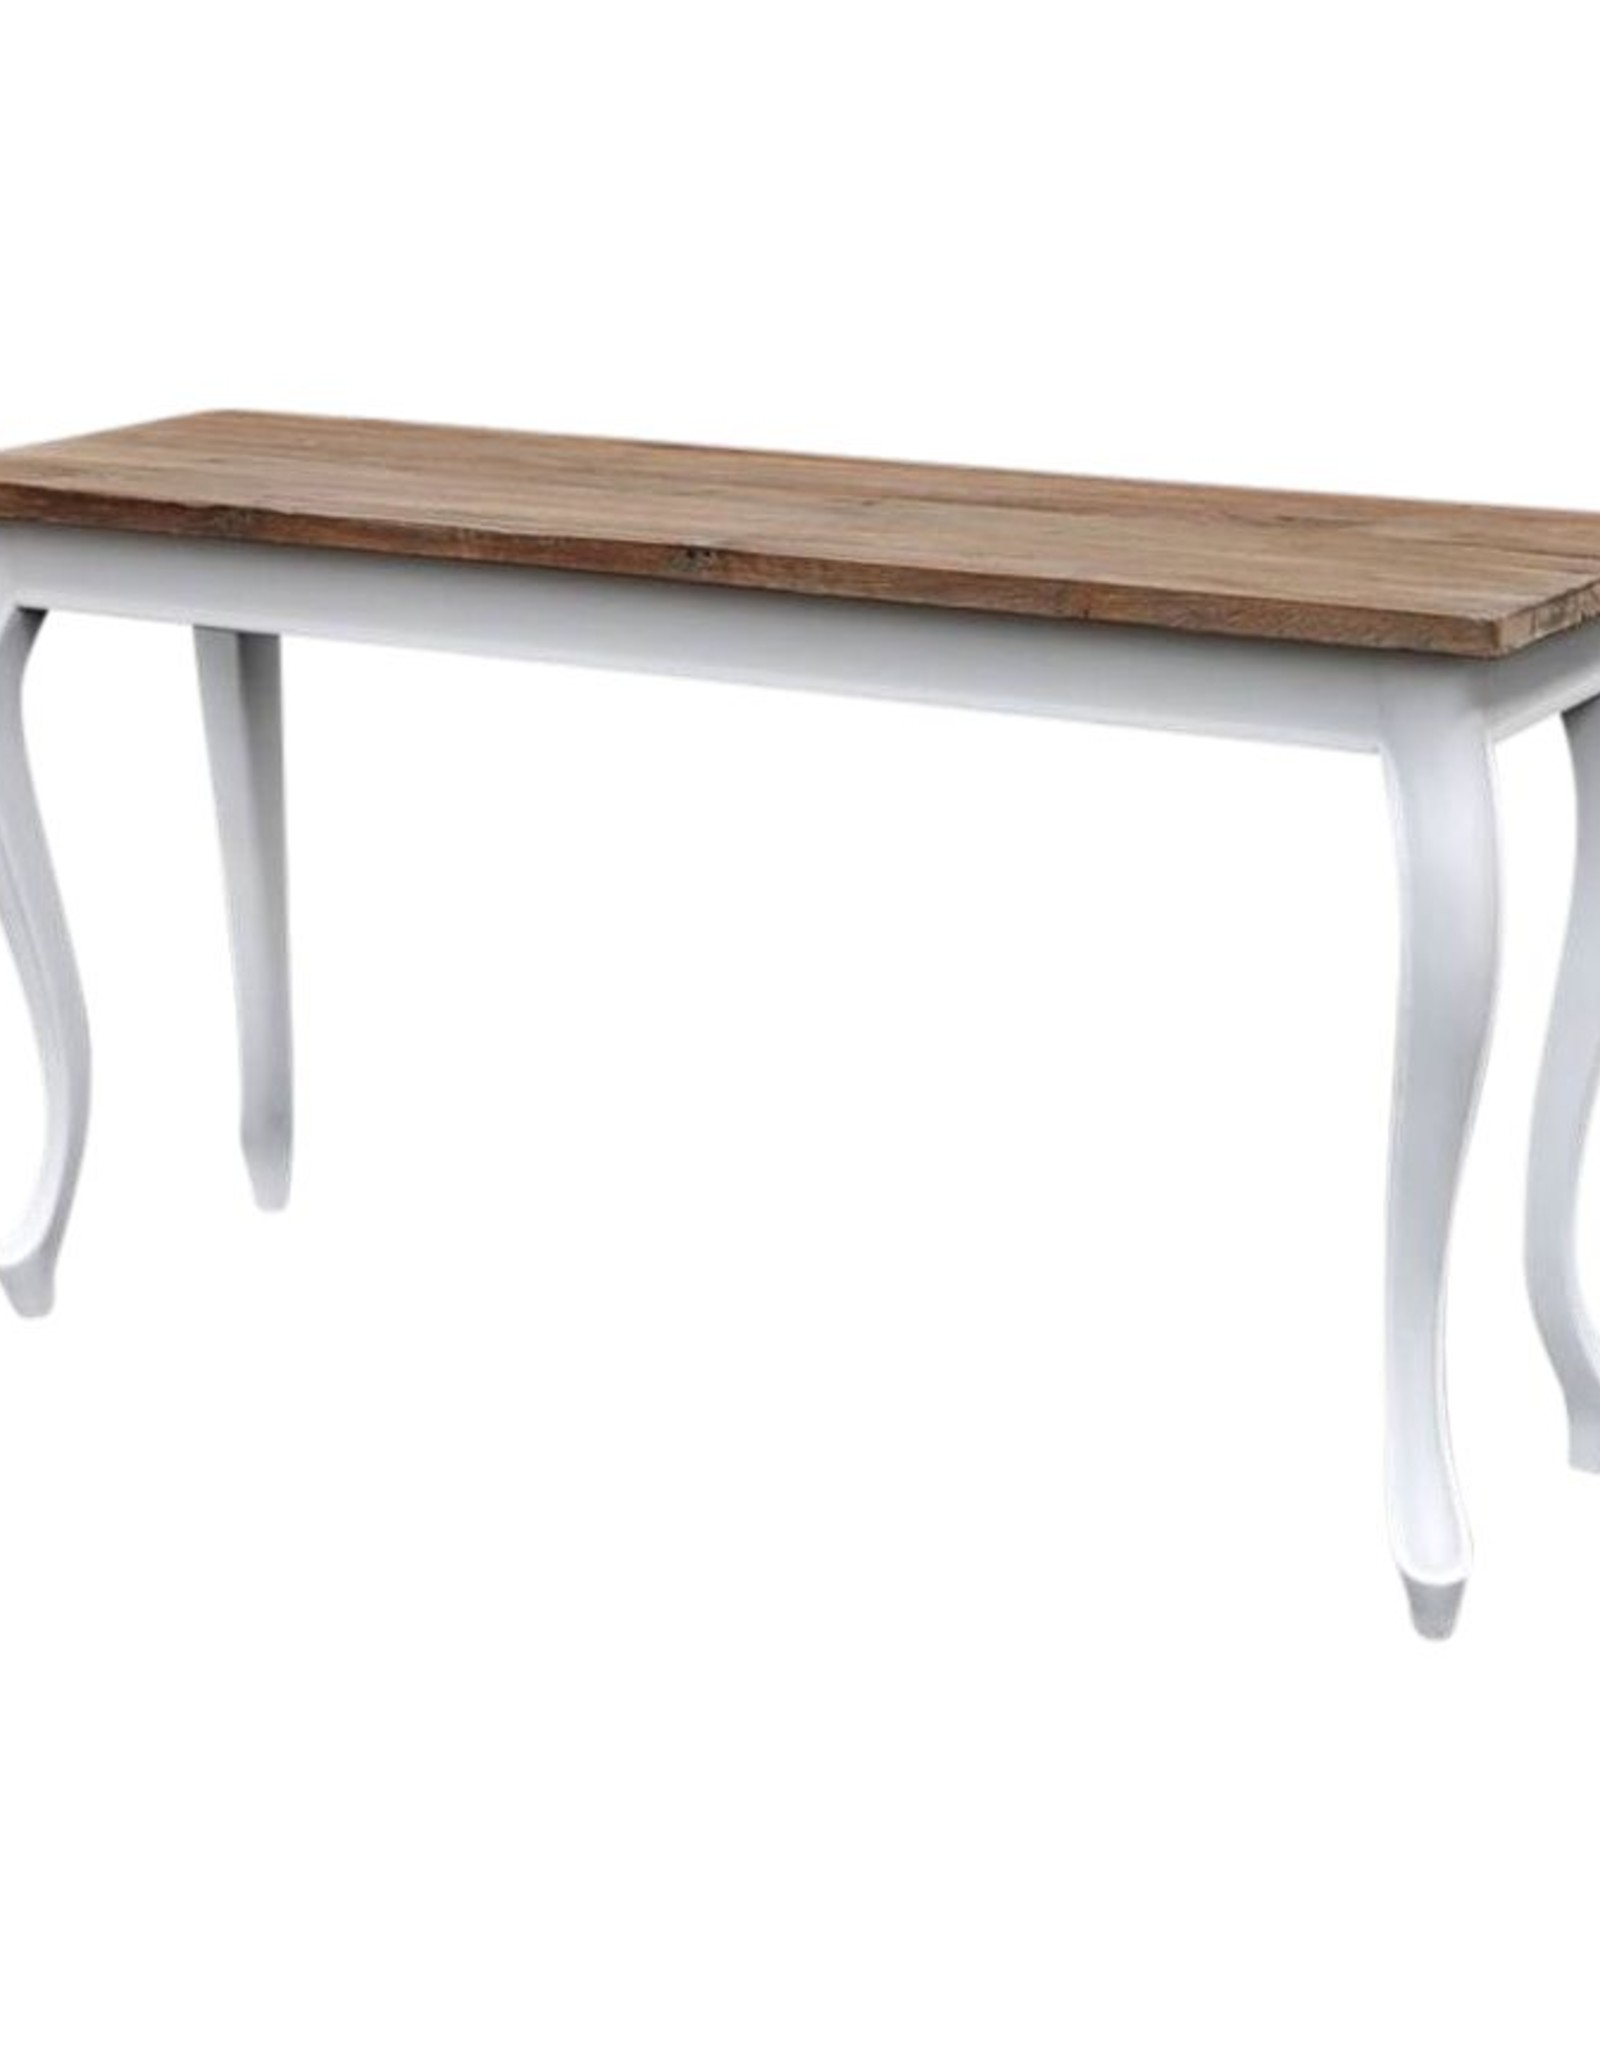 Table d'appoint Gareng